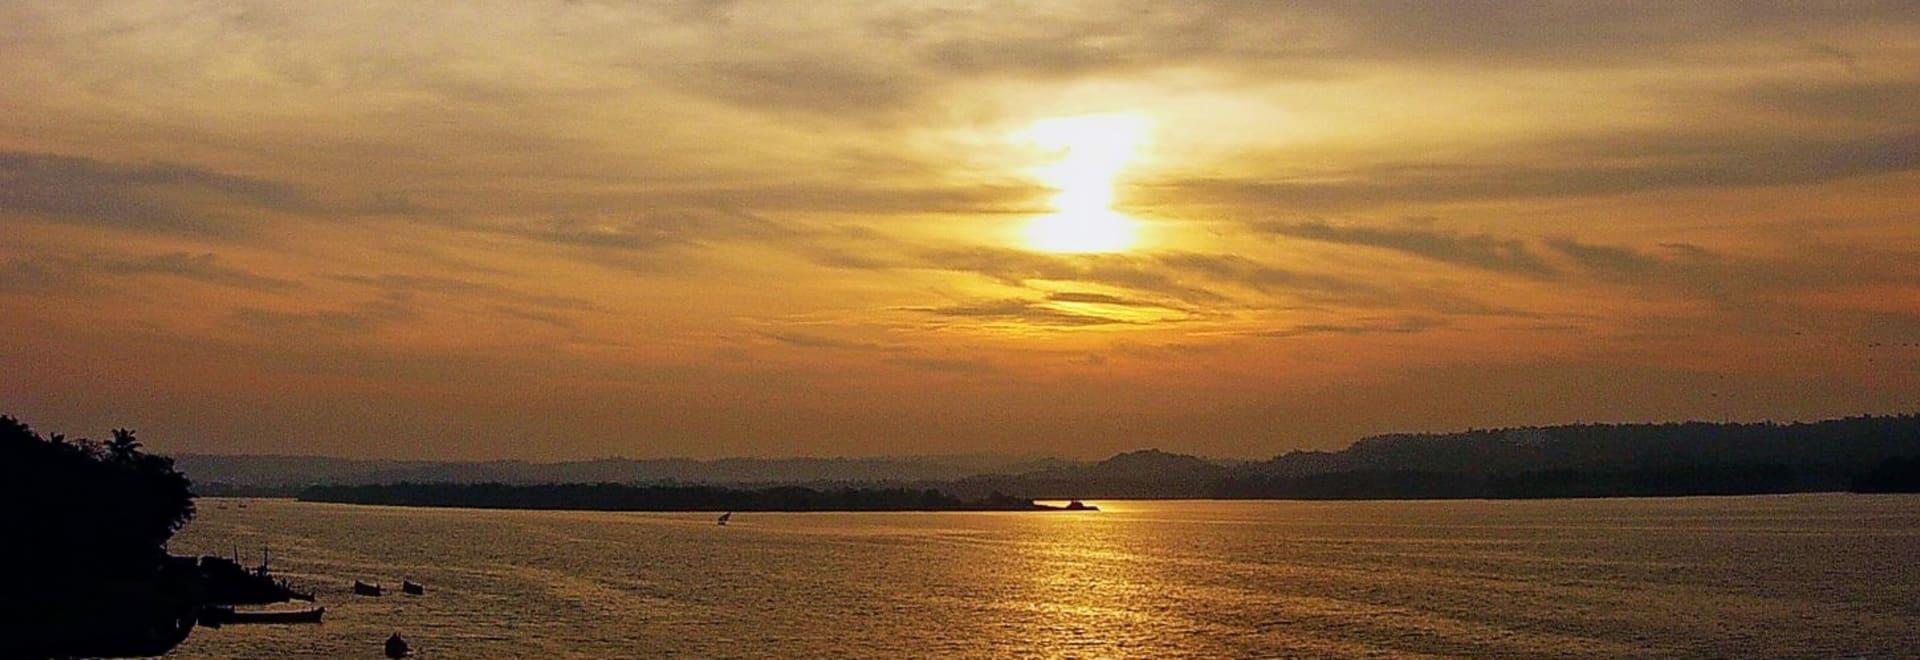 Mangalore-by_deepak_sharma-flickr.jpg